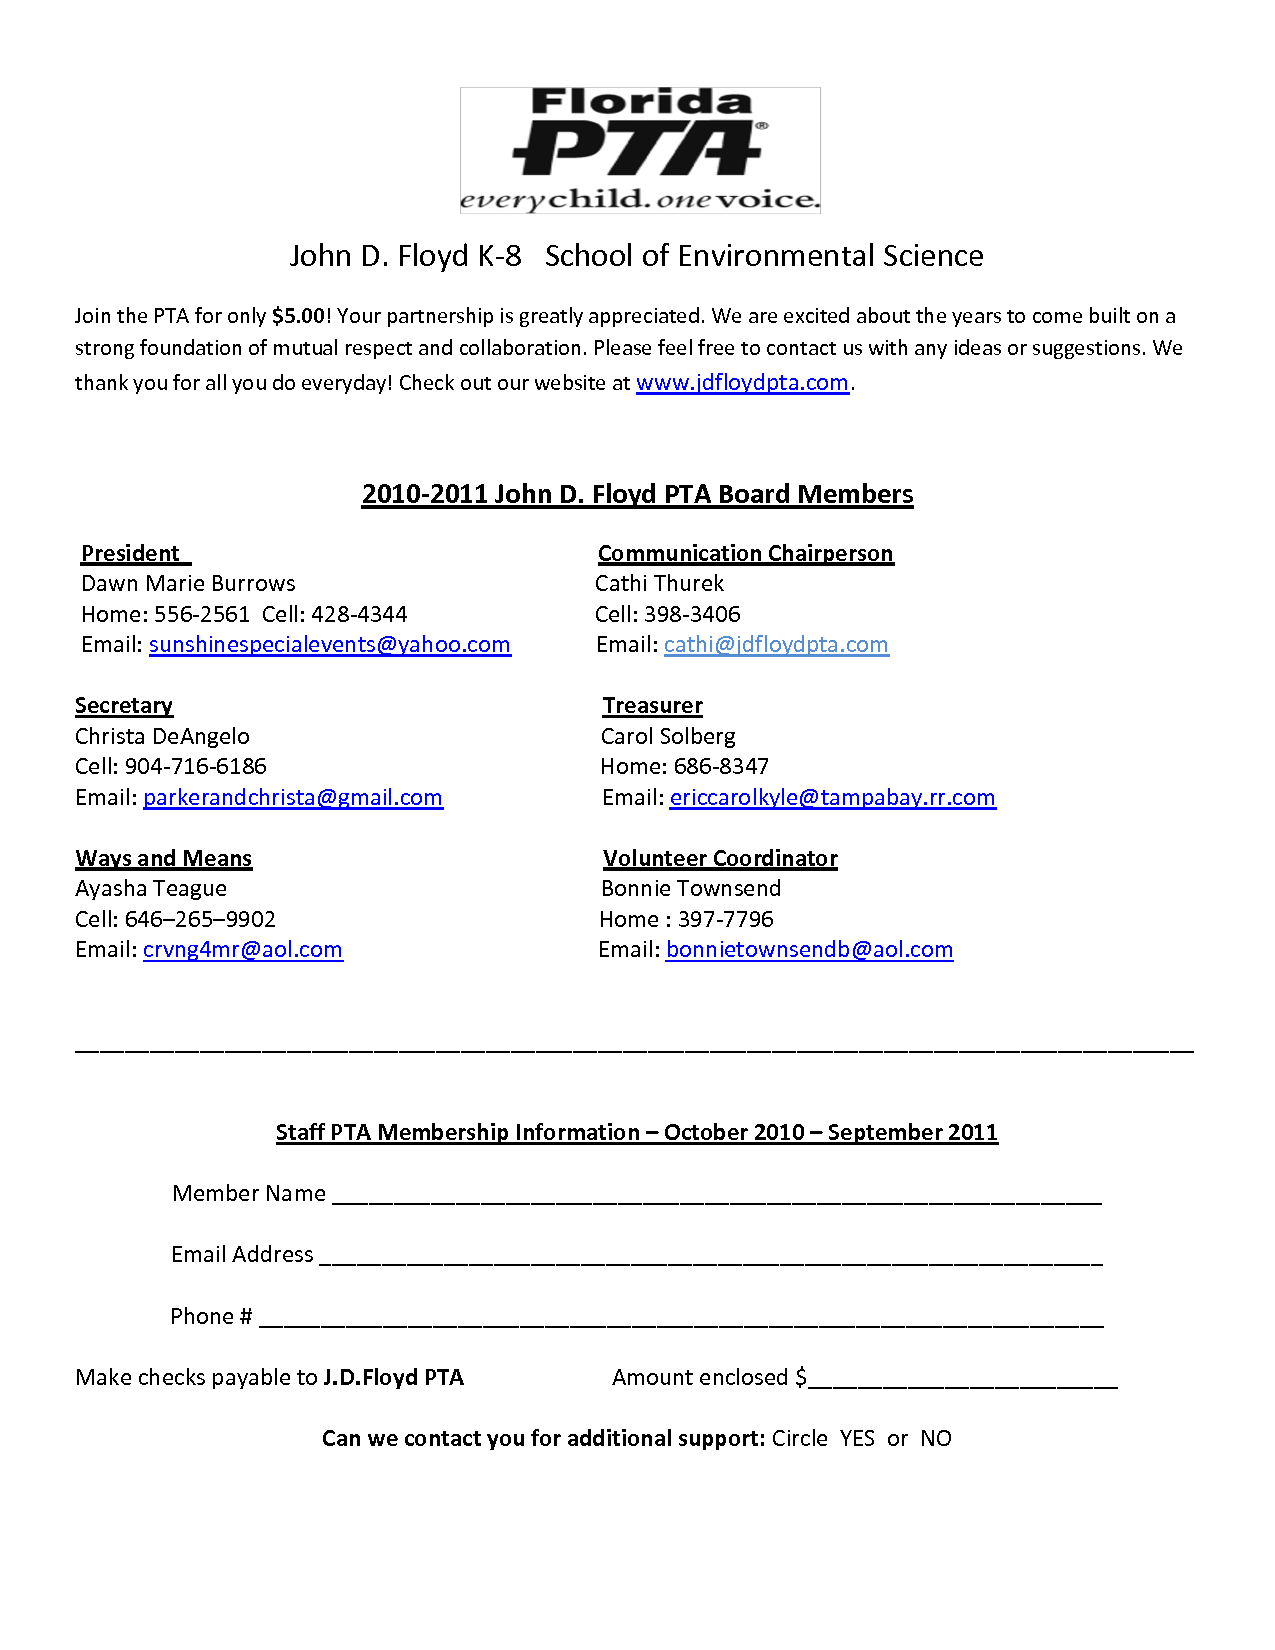 PTA Membership Form | PTA | Pinterest | Pta